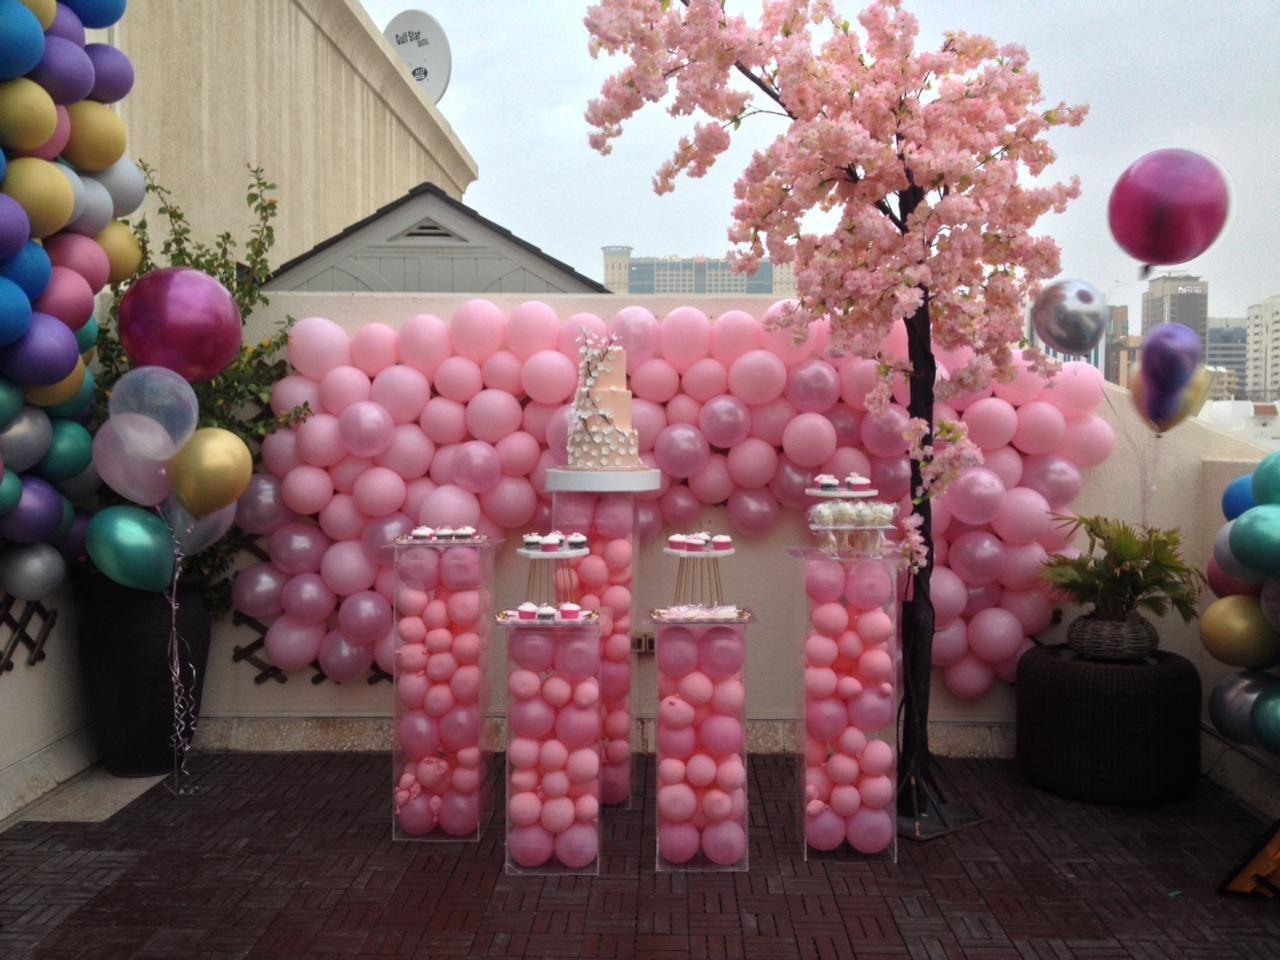 balloons balloondecor Balloons, Balloon decorations